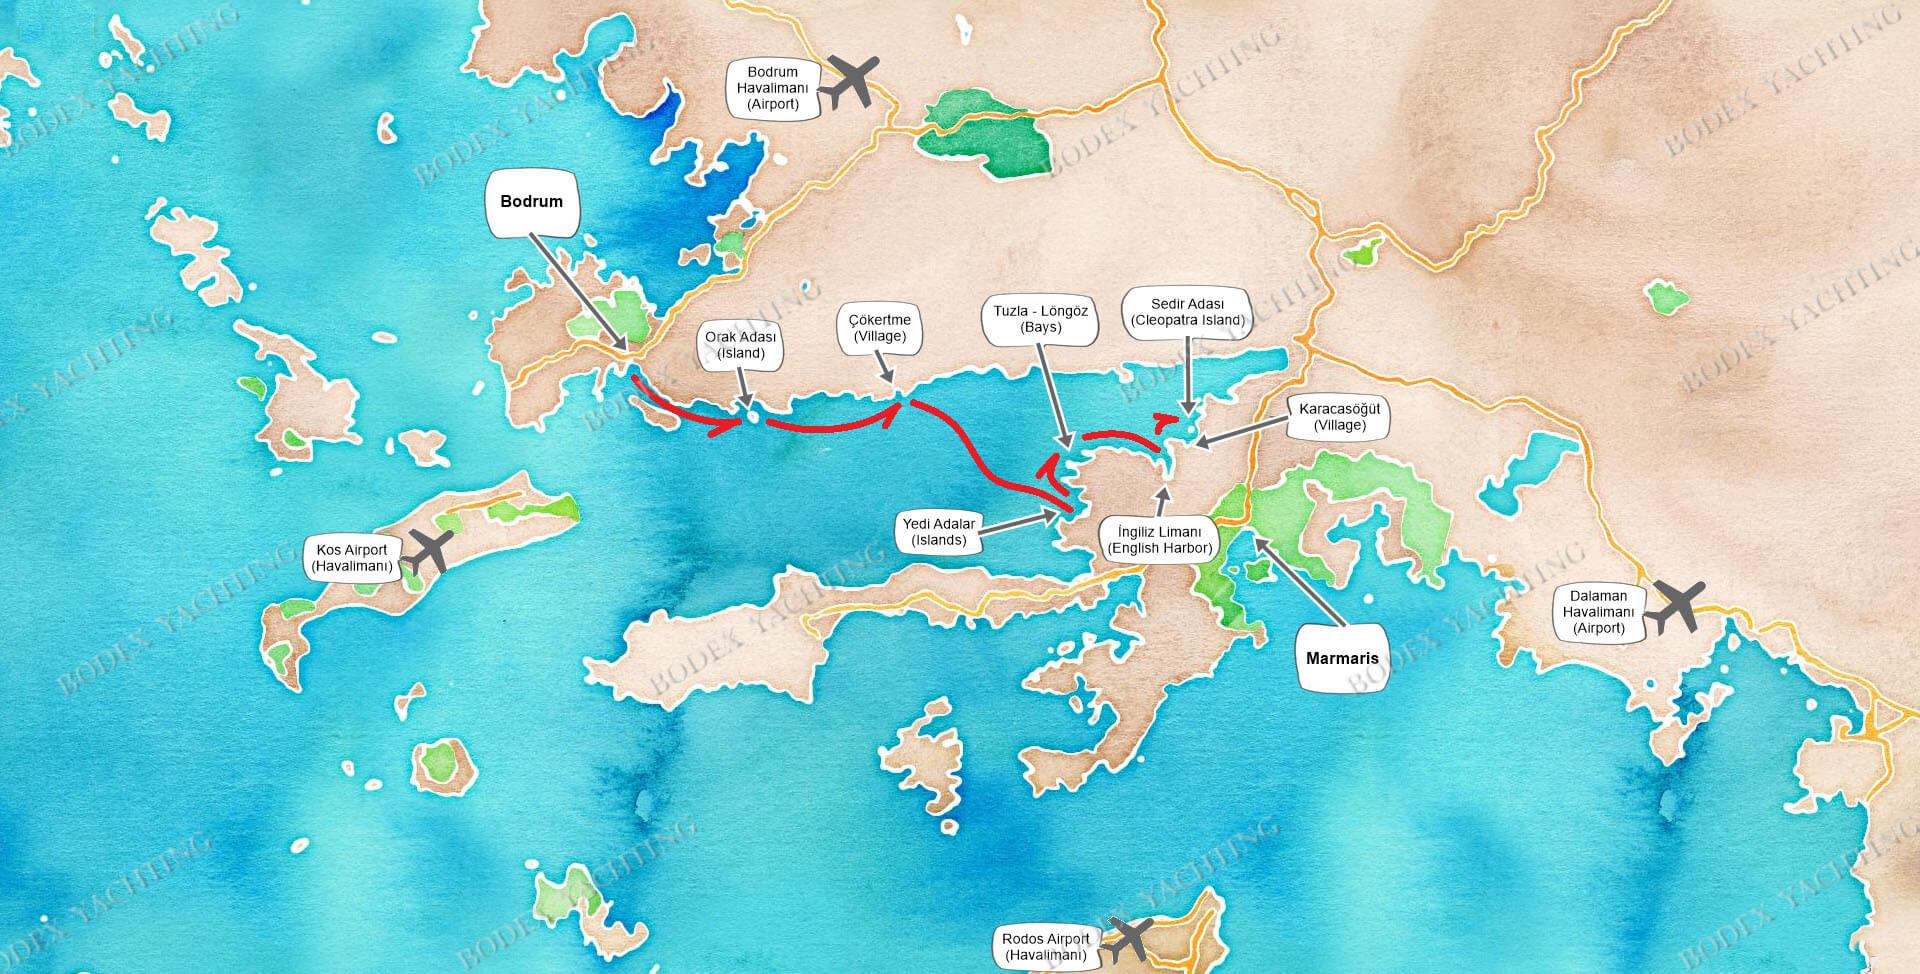 CABIN Charter - Bodrum to Karacasogut